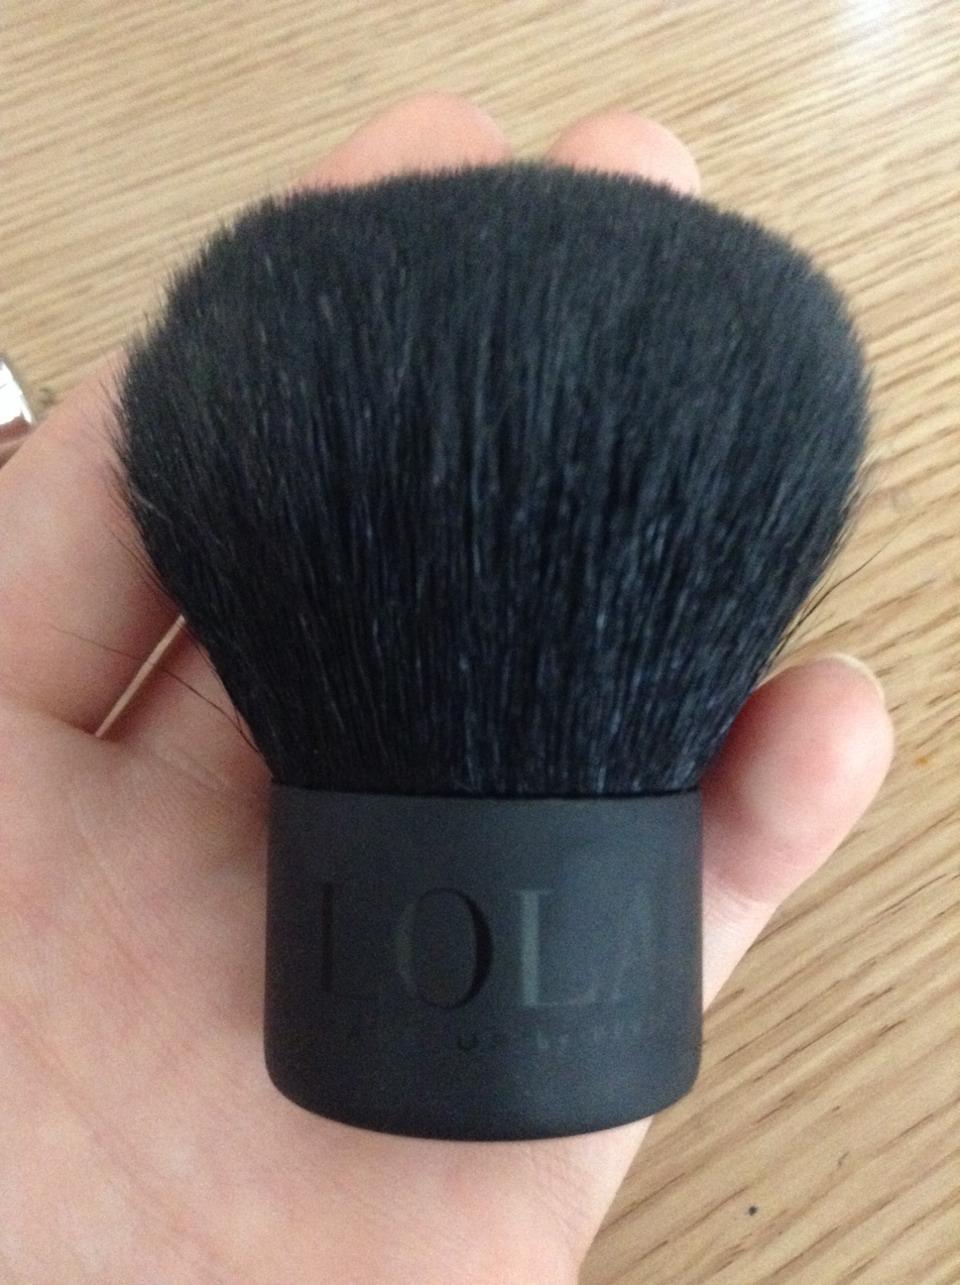 My favourite make up brush good for powder